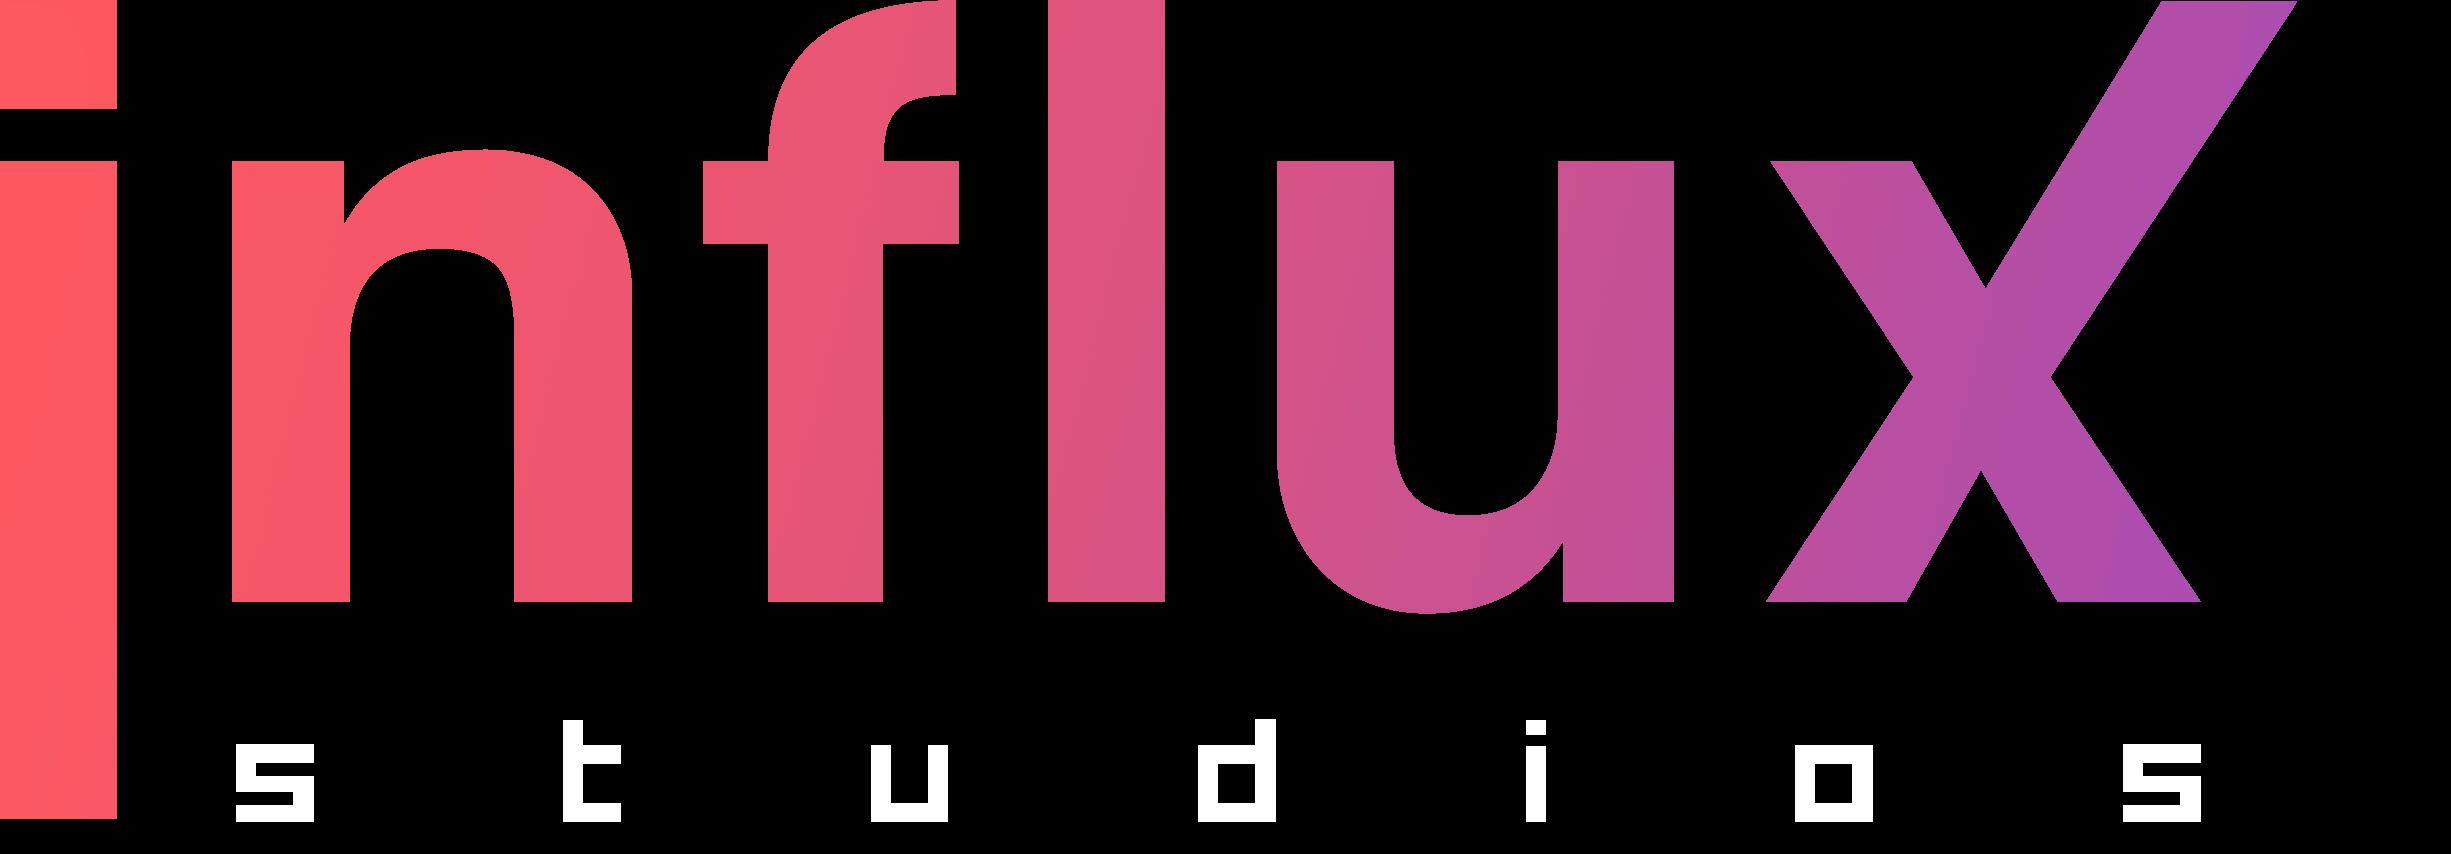 Influx Studios Gradient Main Logo